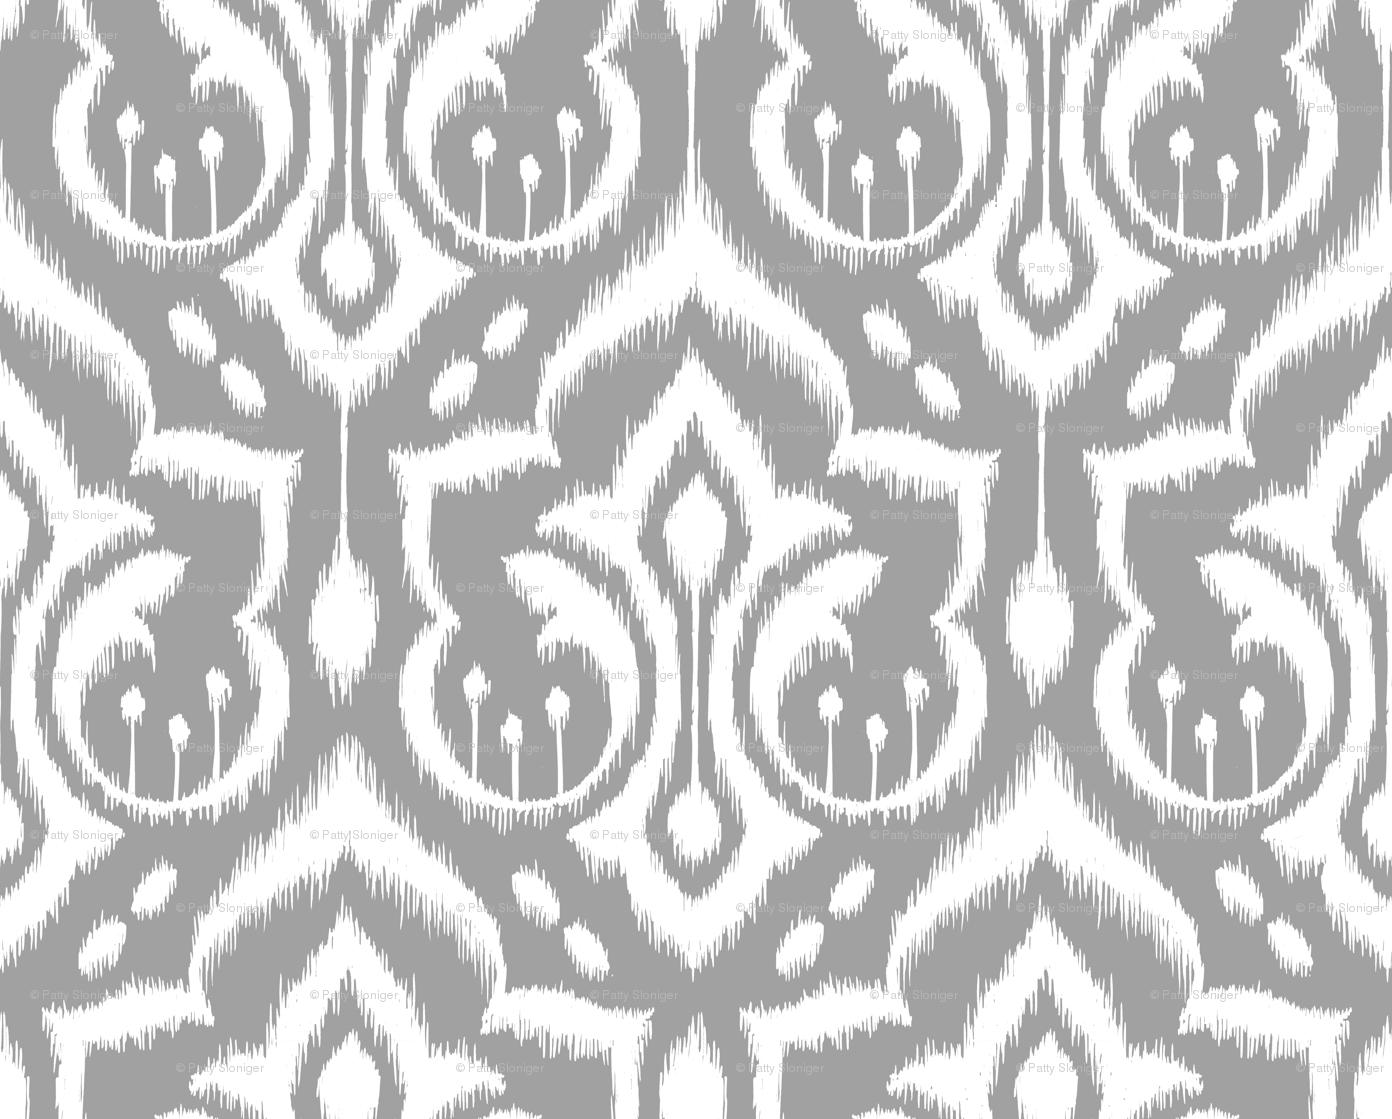 Grey And White Damask Wallpaper Ikat damask gr 1392x1119